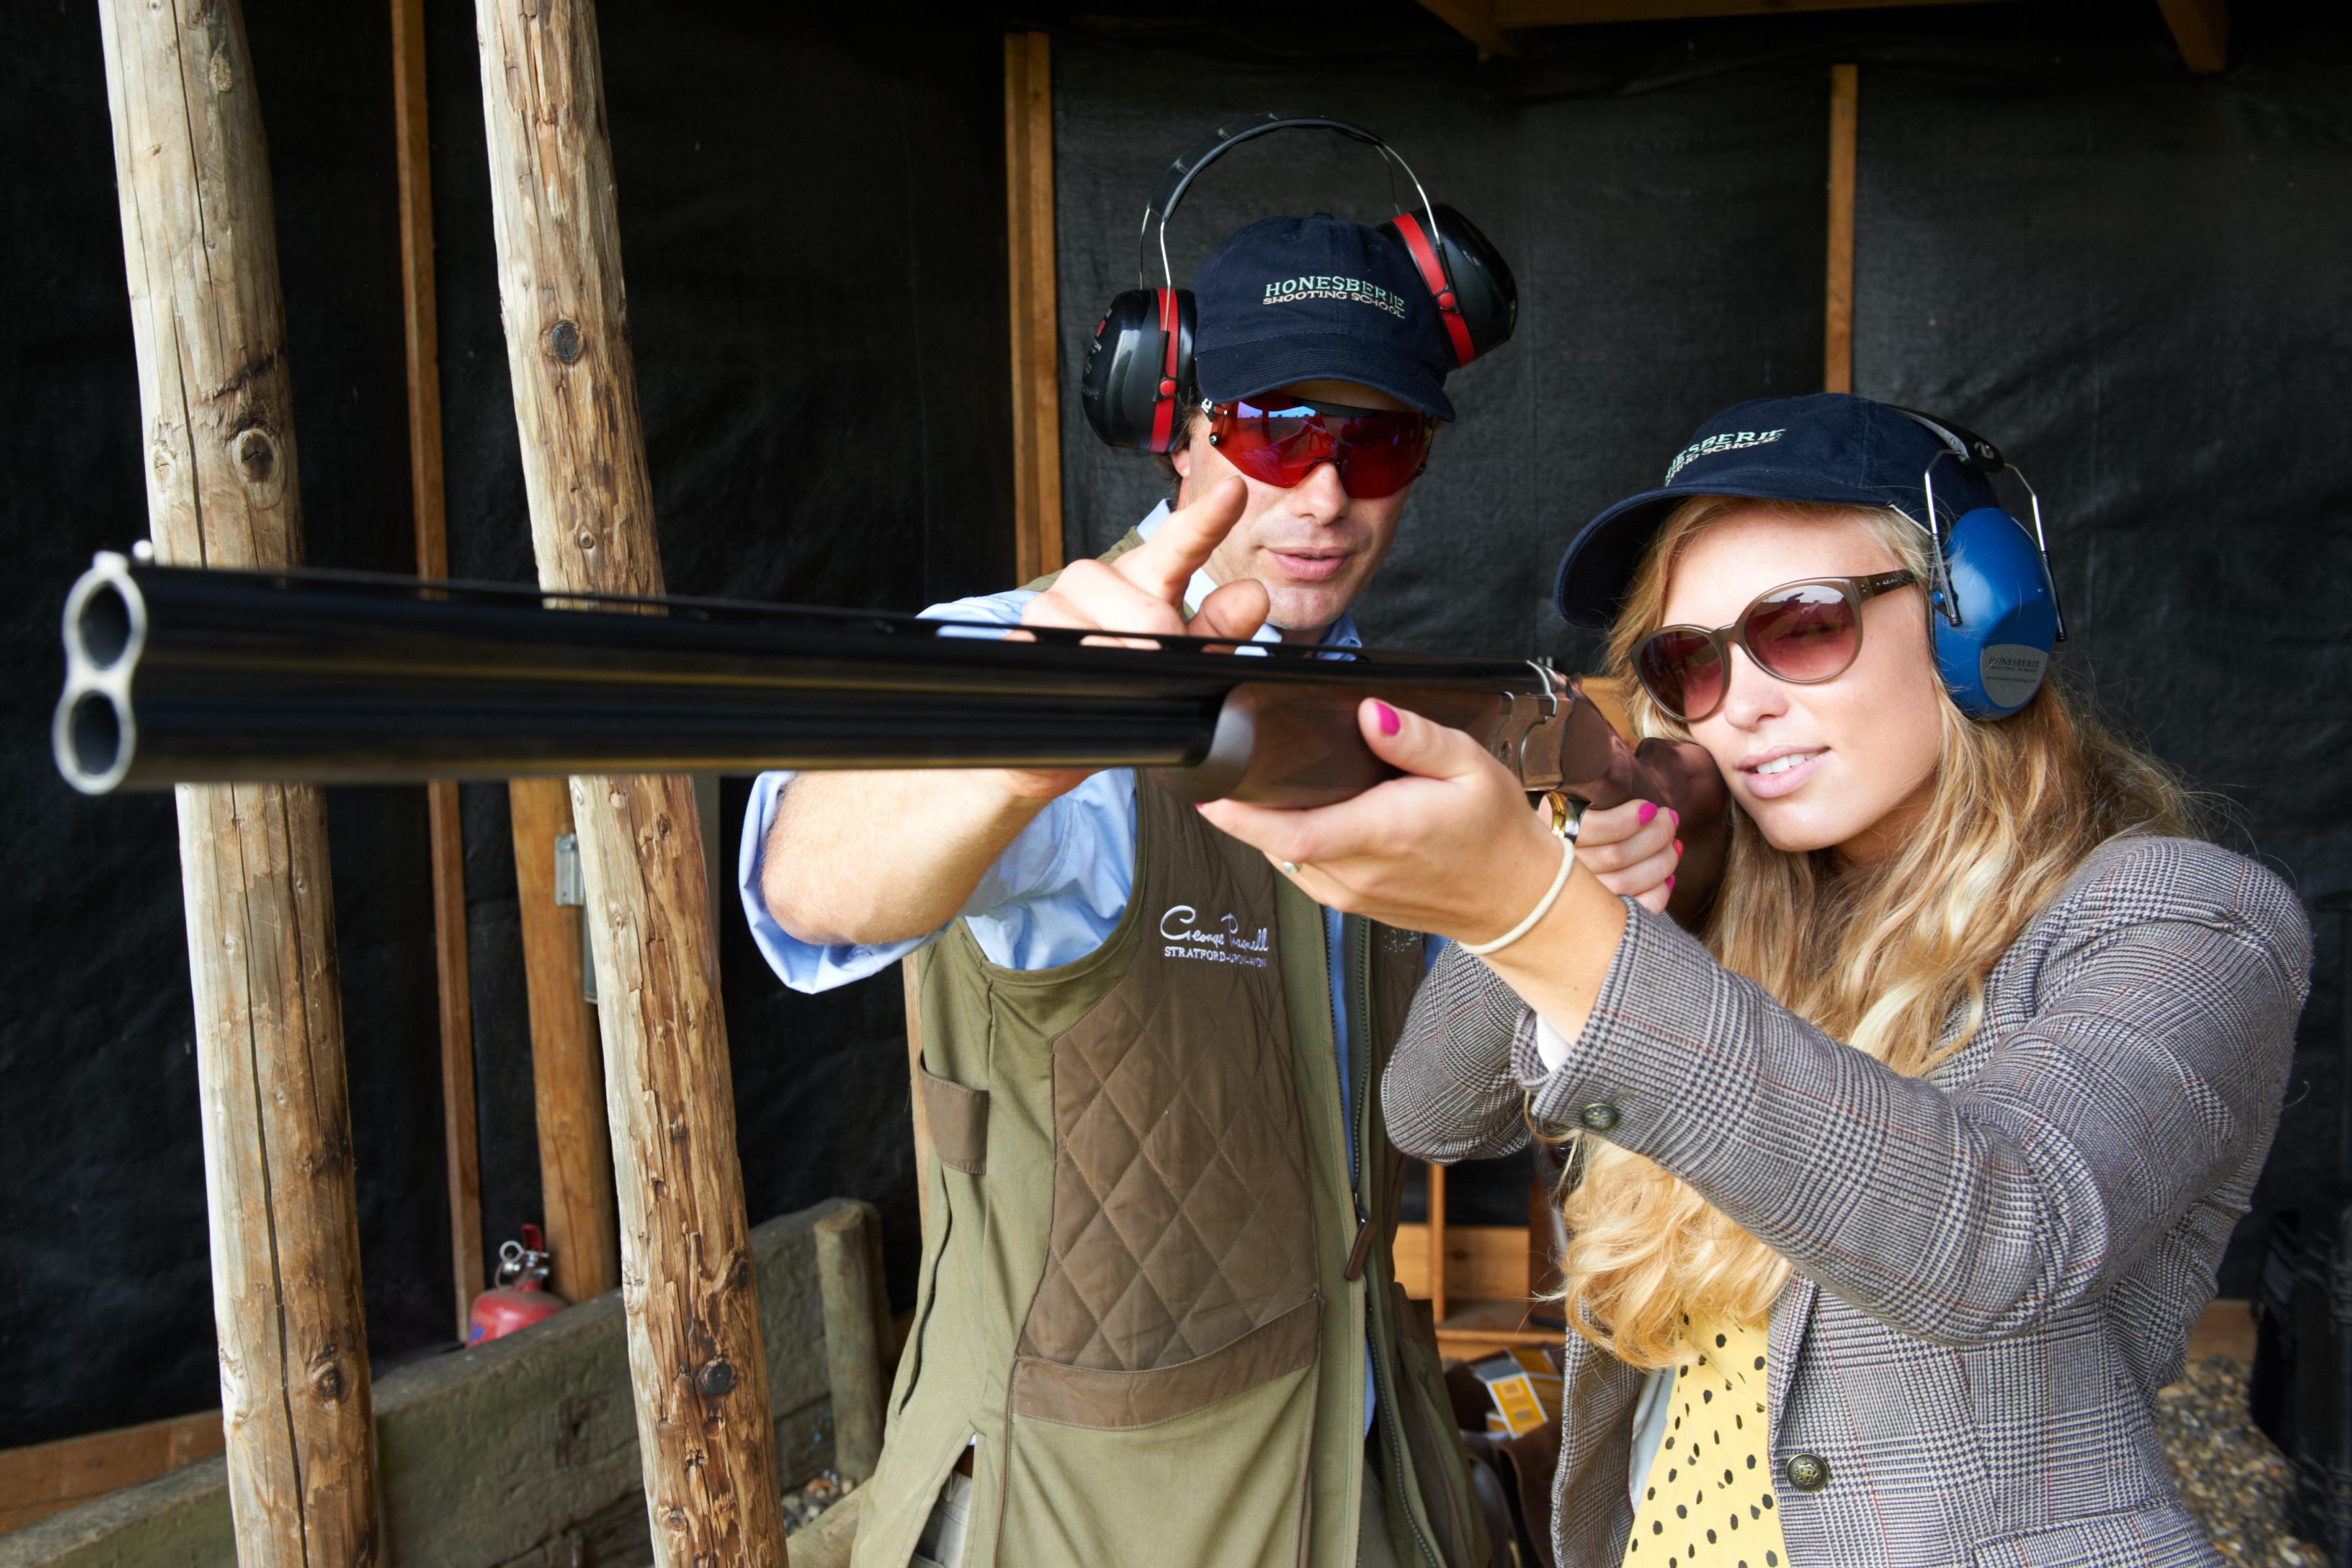 Lady With Shotgun